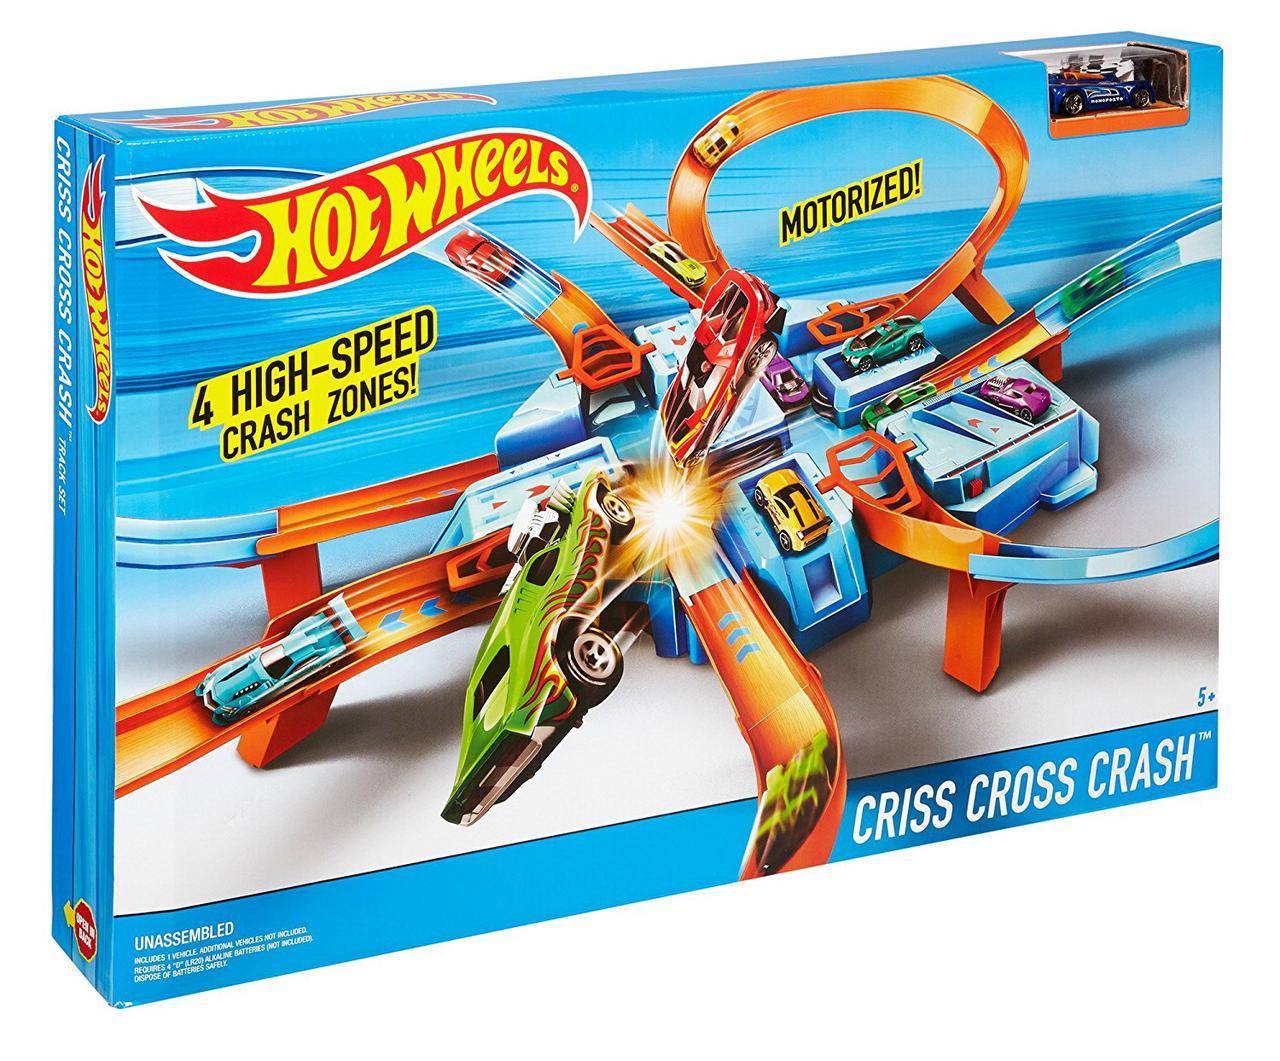 Трек Хот Вилз перекрестное столкновение / Hot Wheels Criss Cross Crash Trackset